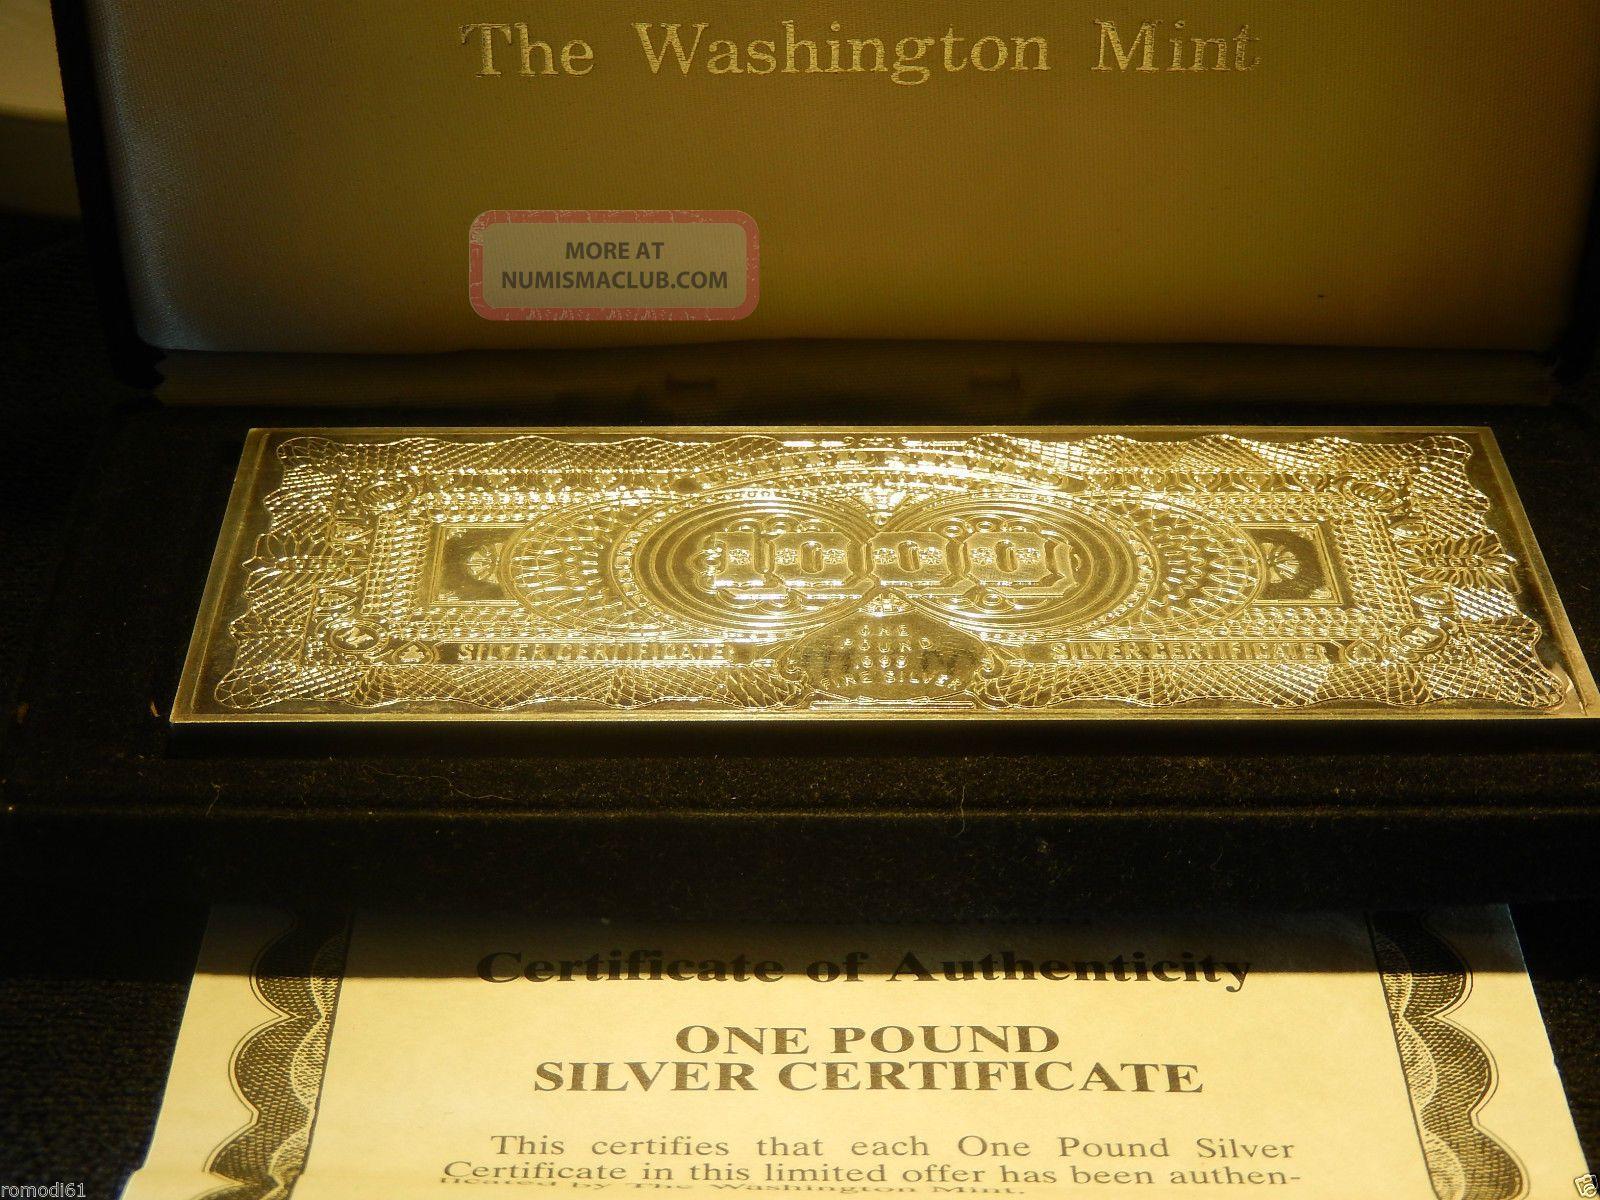 The Washington 1 Pound 1000 Silver Certificate 999